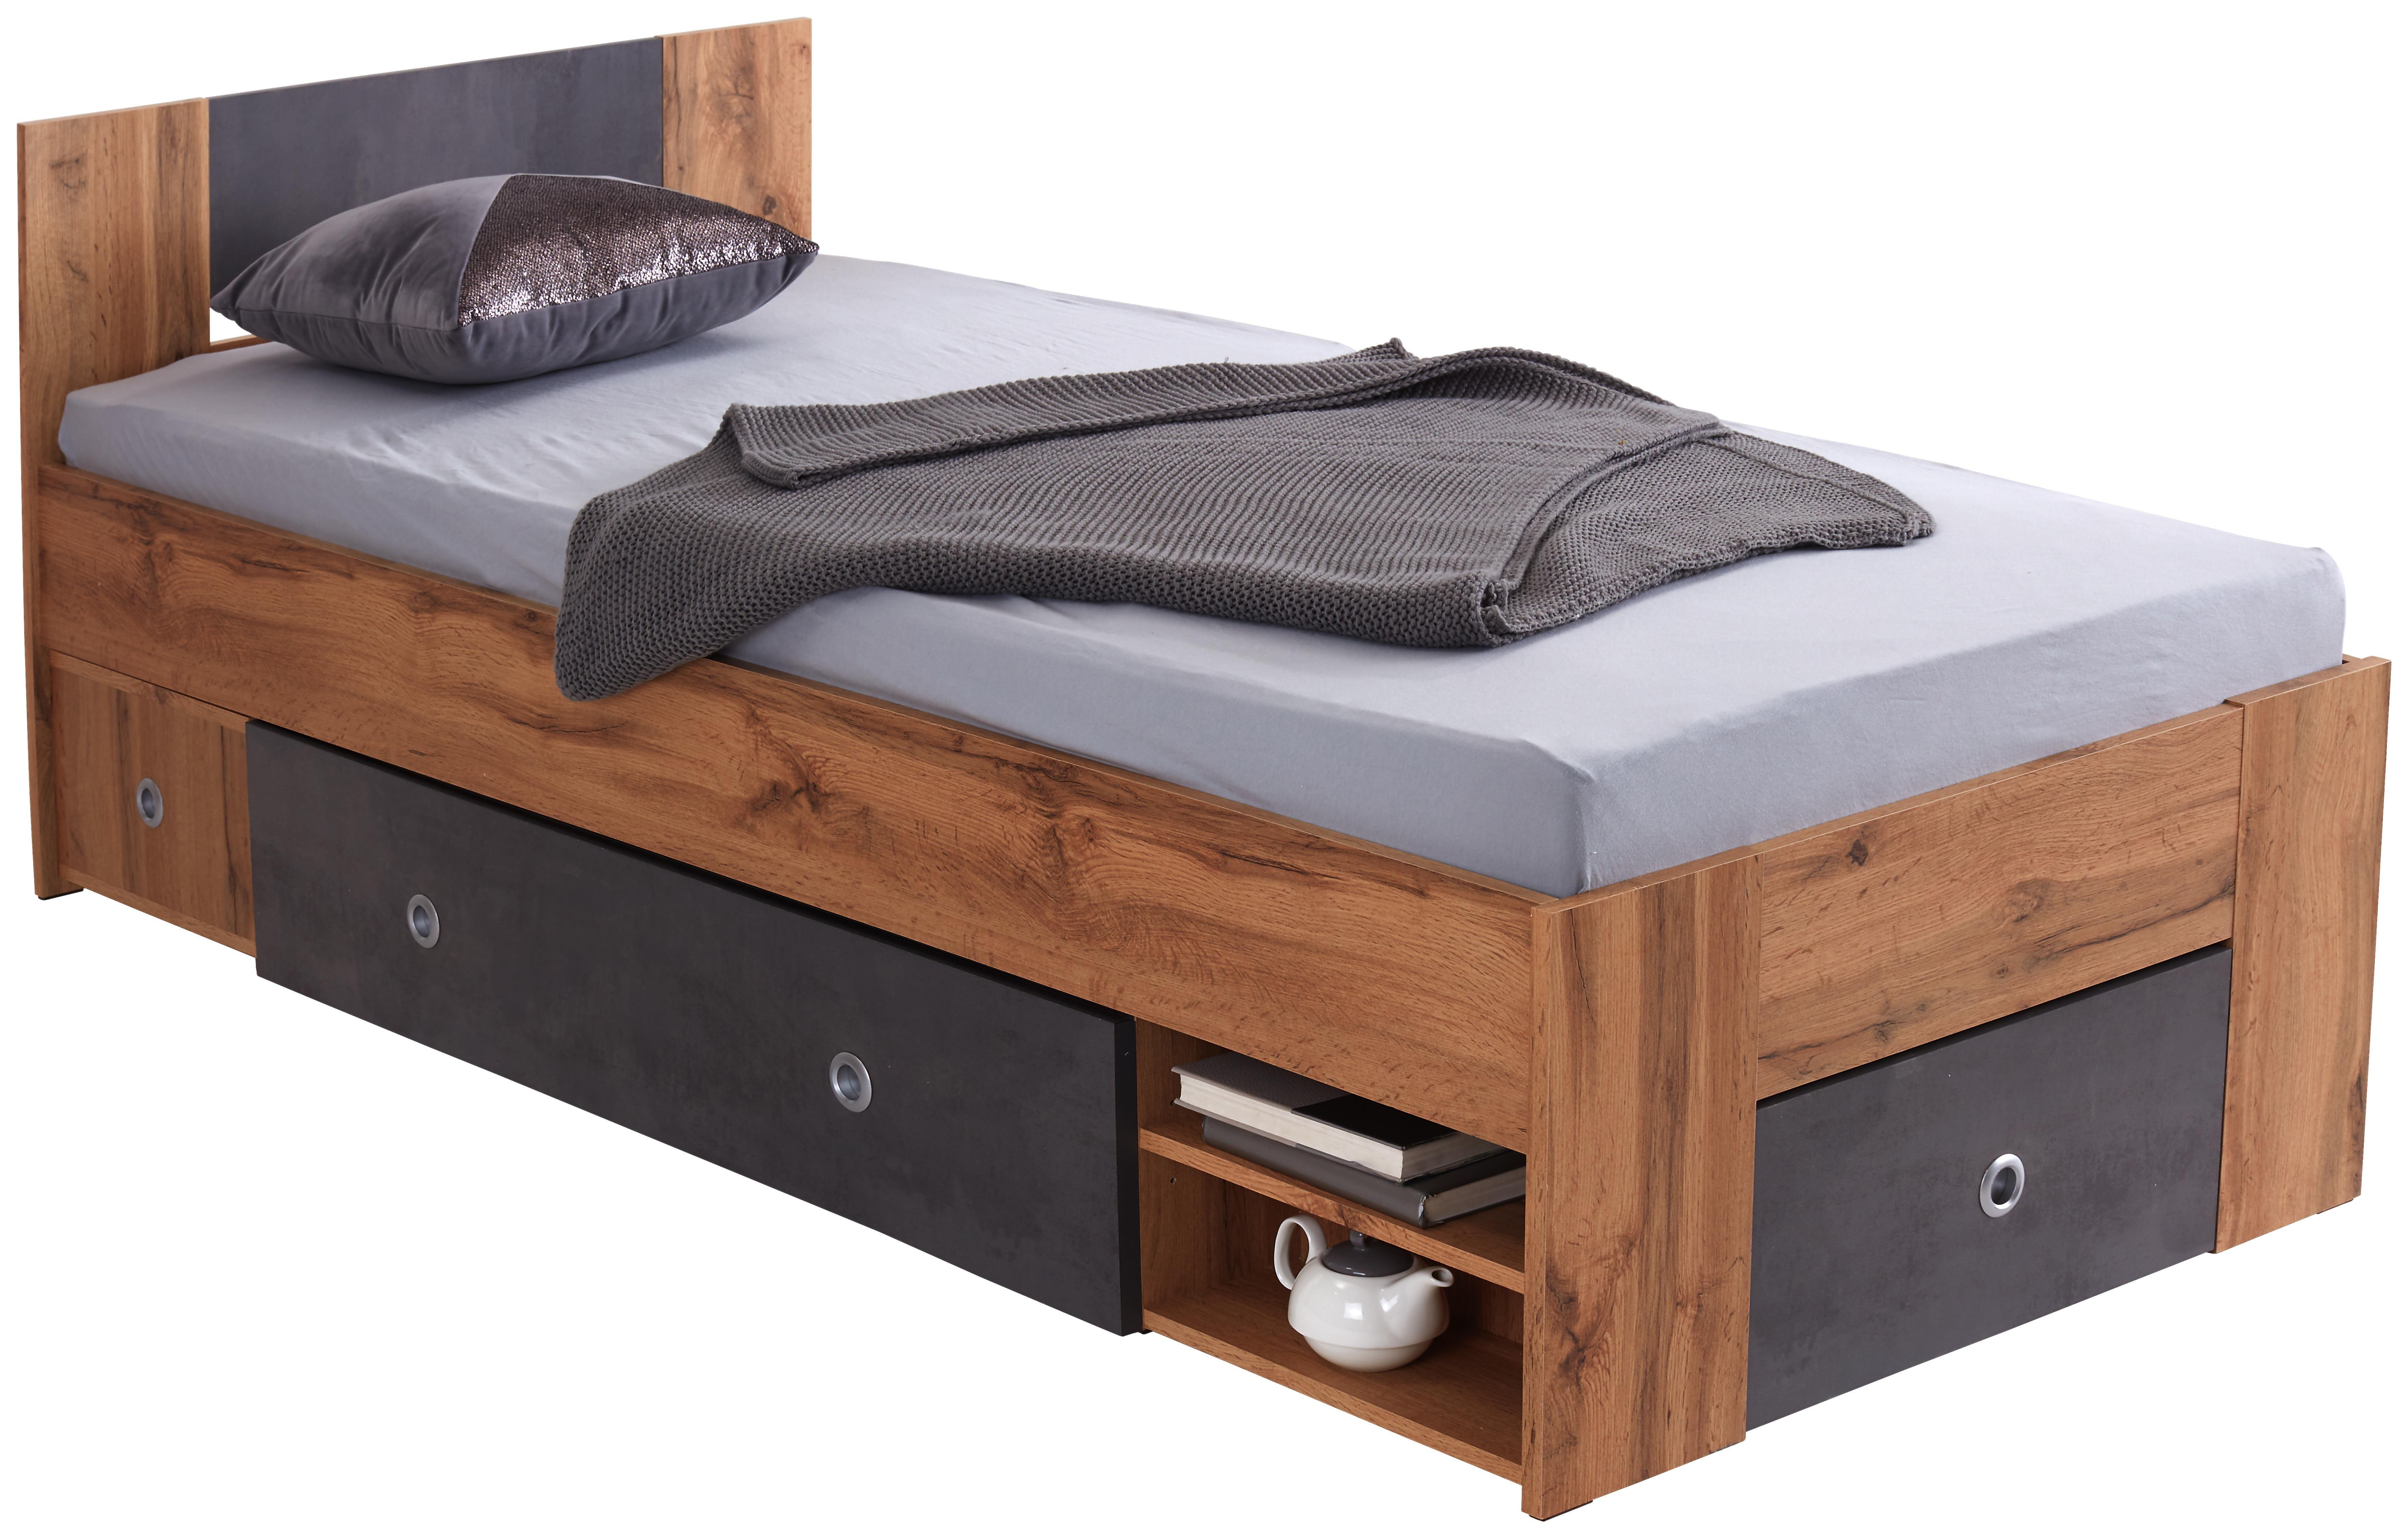 Postelja Azurro 90 - jelša, Moderno, leseni material (204/75/95cm) - Mömax modern living